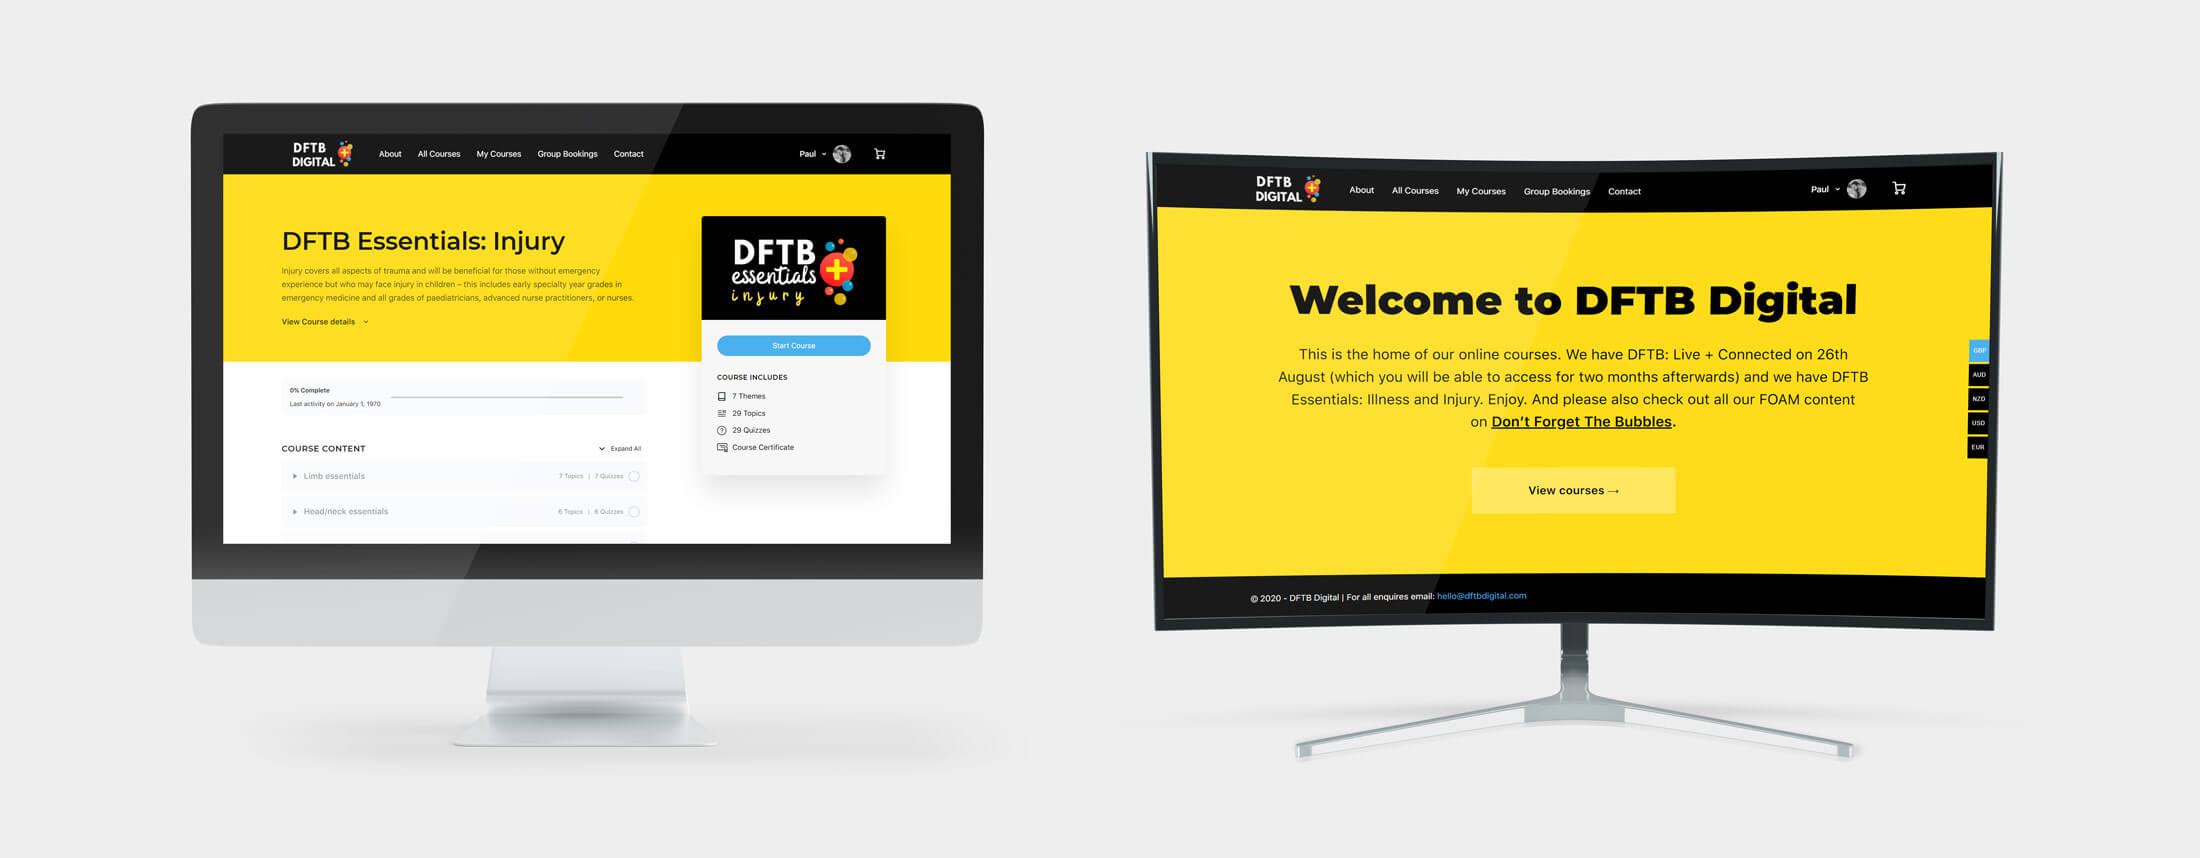 DFTB Digital Responsive Web Design - Desktop Views